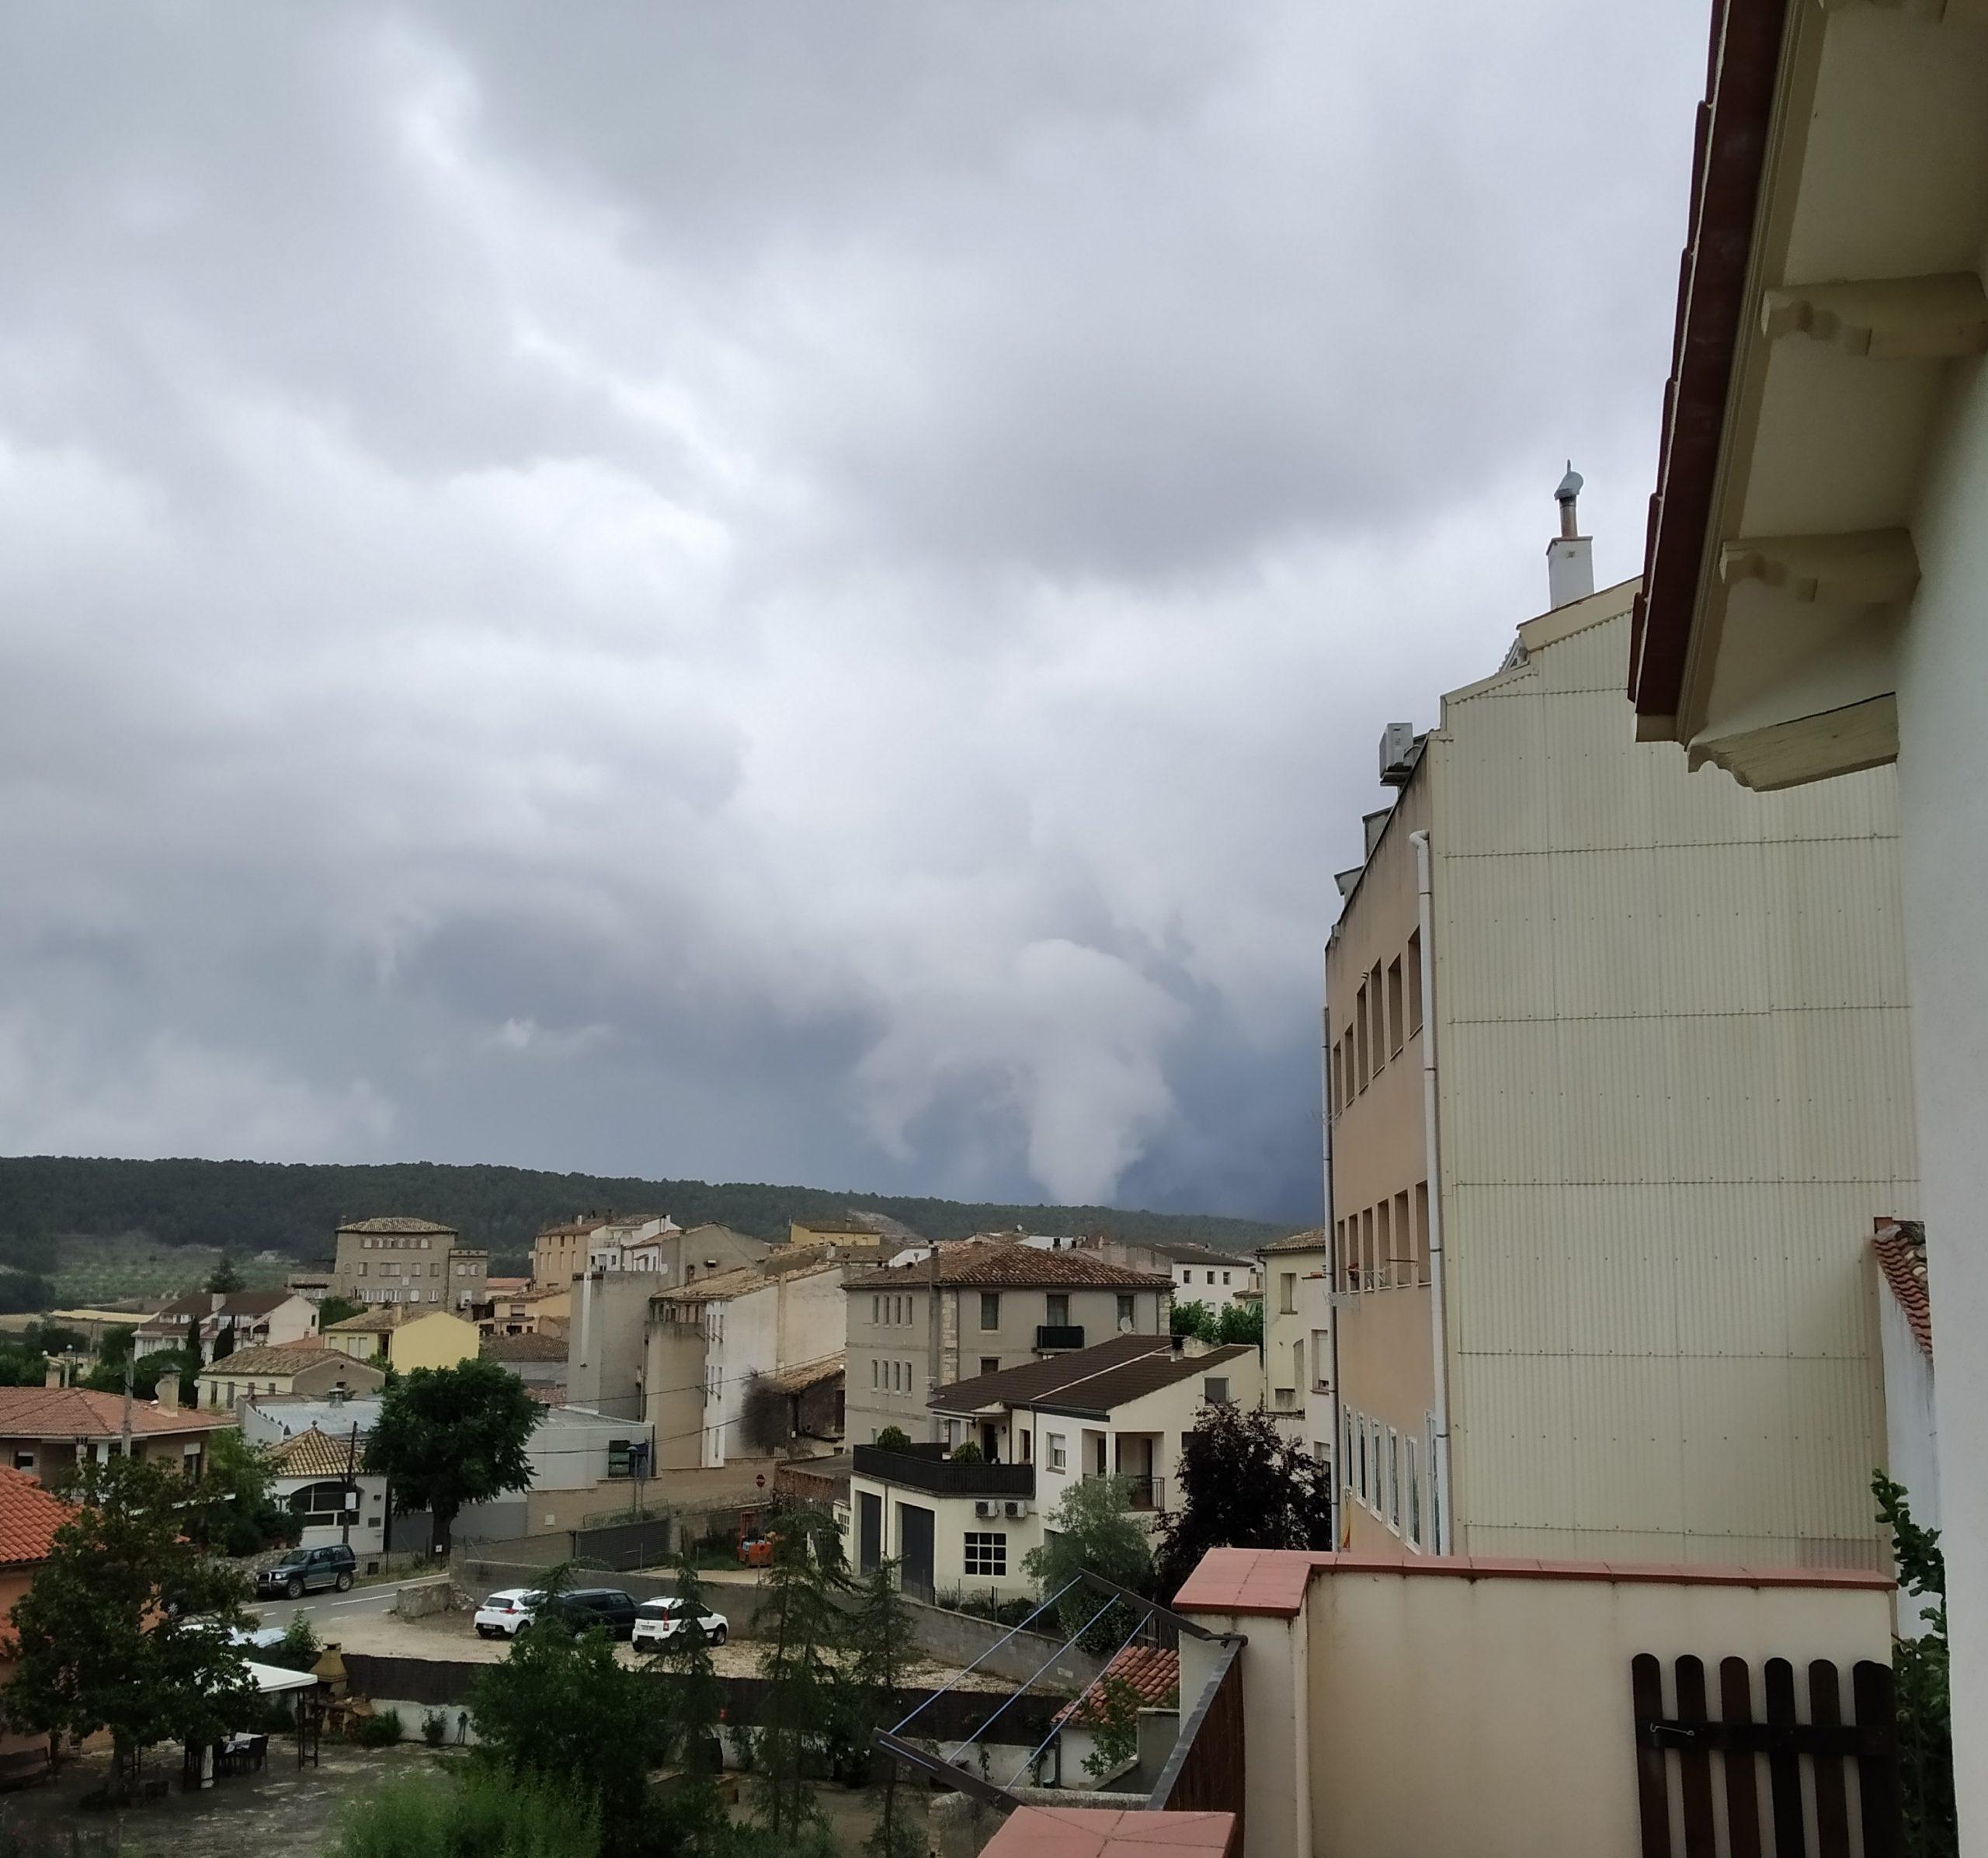 El tornado, vist des de la Llacuna | ACN